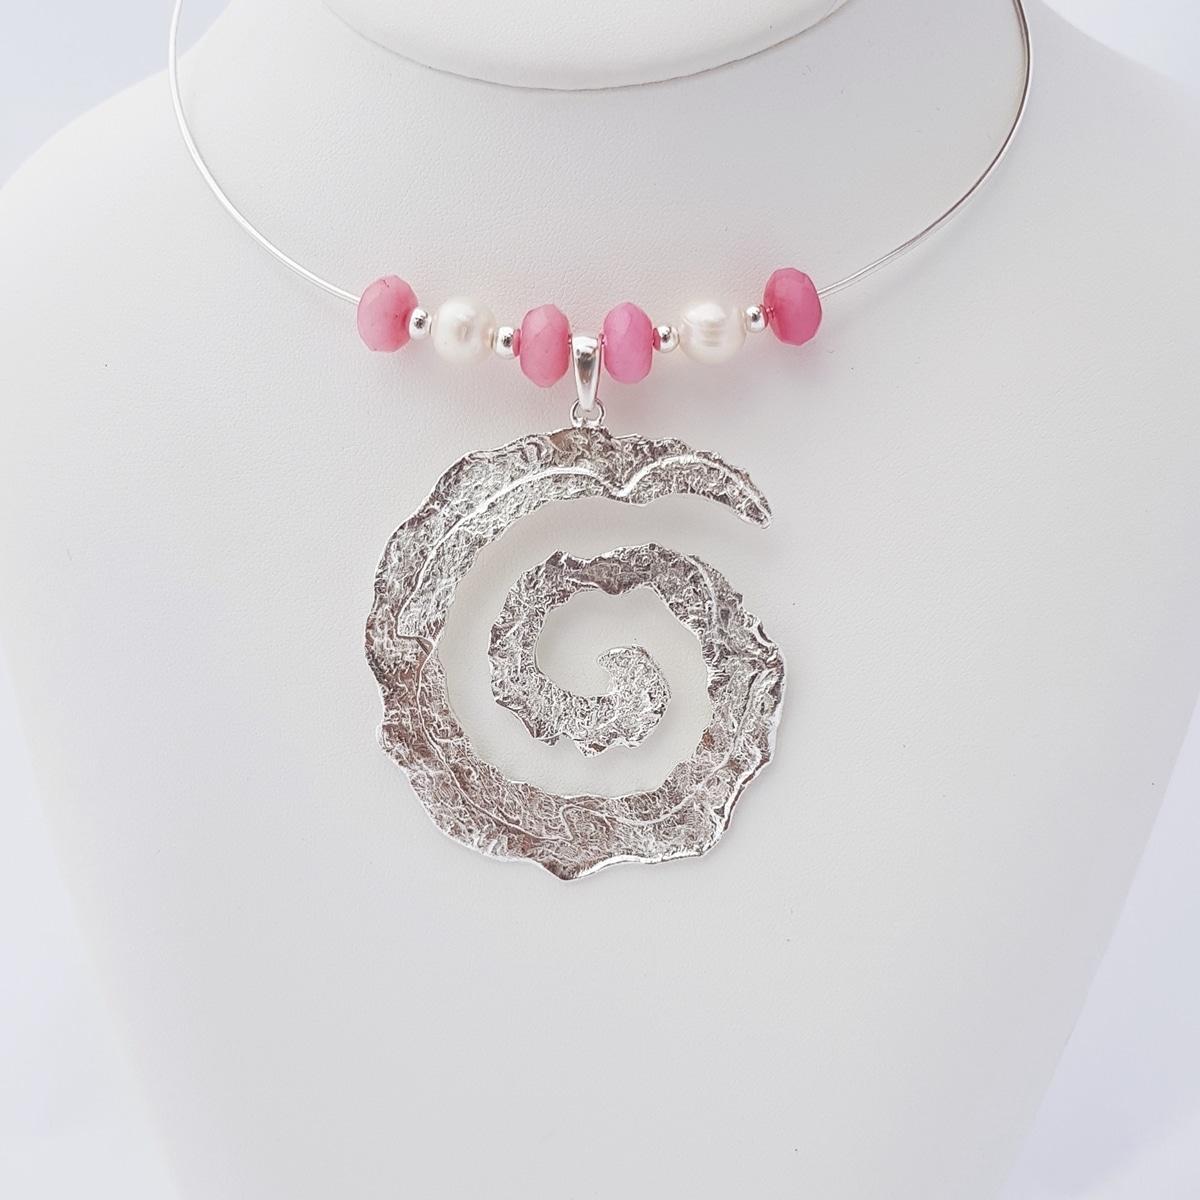 Colgante espiral de plata artesanal con ágata rosa y perlas. Joyas Siliva.